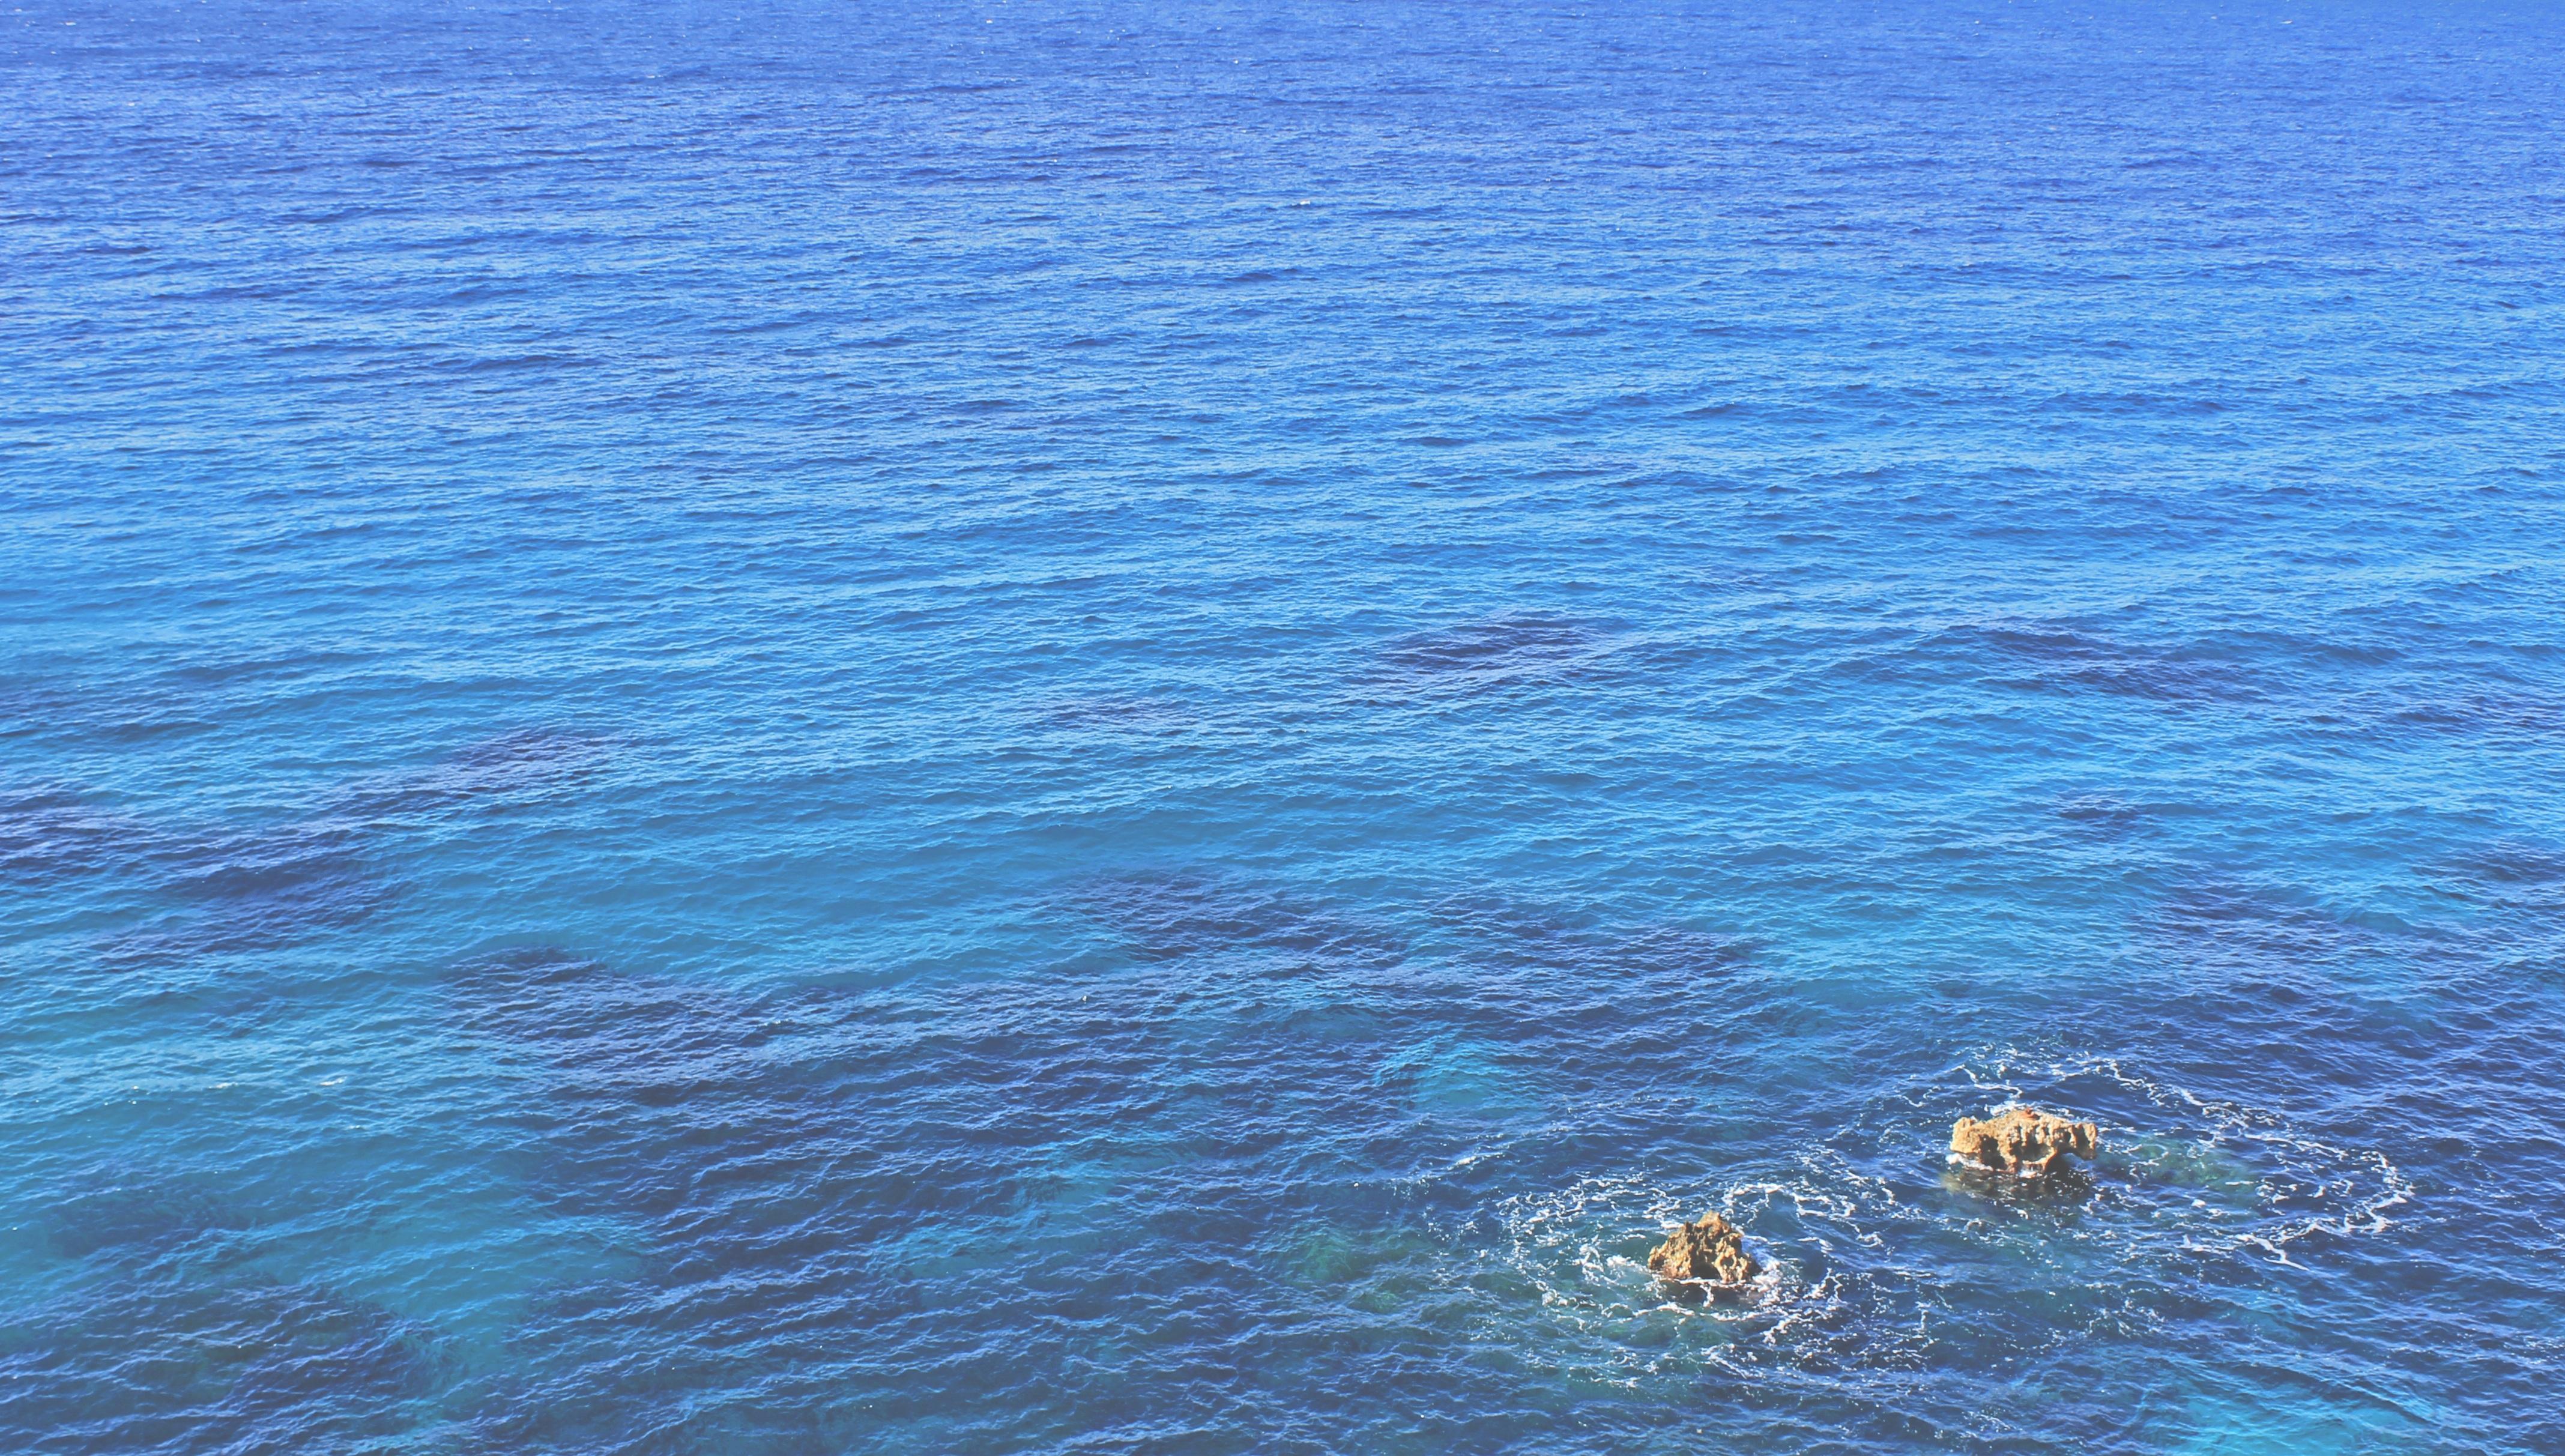 calm water texture. Sea Coast Water Nature Ocean Liquid Texture Shore Wave Ripple Clear Tranquil Peaceful Seascape Fresh Calm